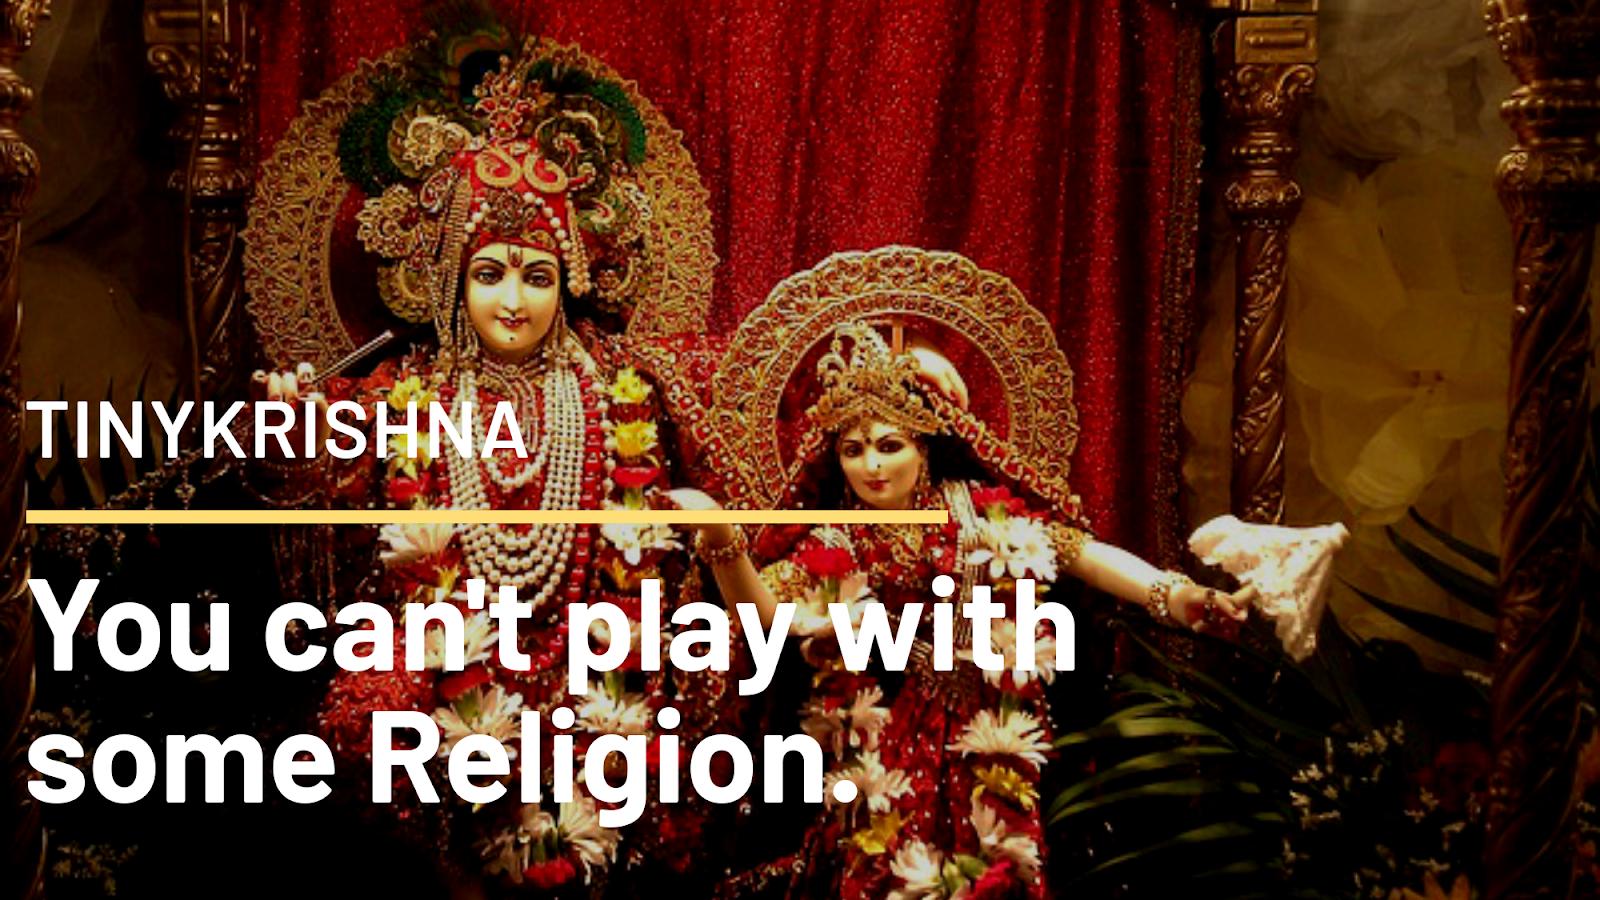 Lord Krishna Stories: Then vs Now | Tiny Krishna